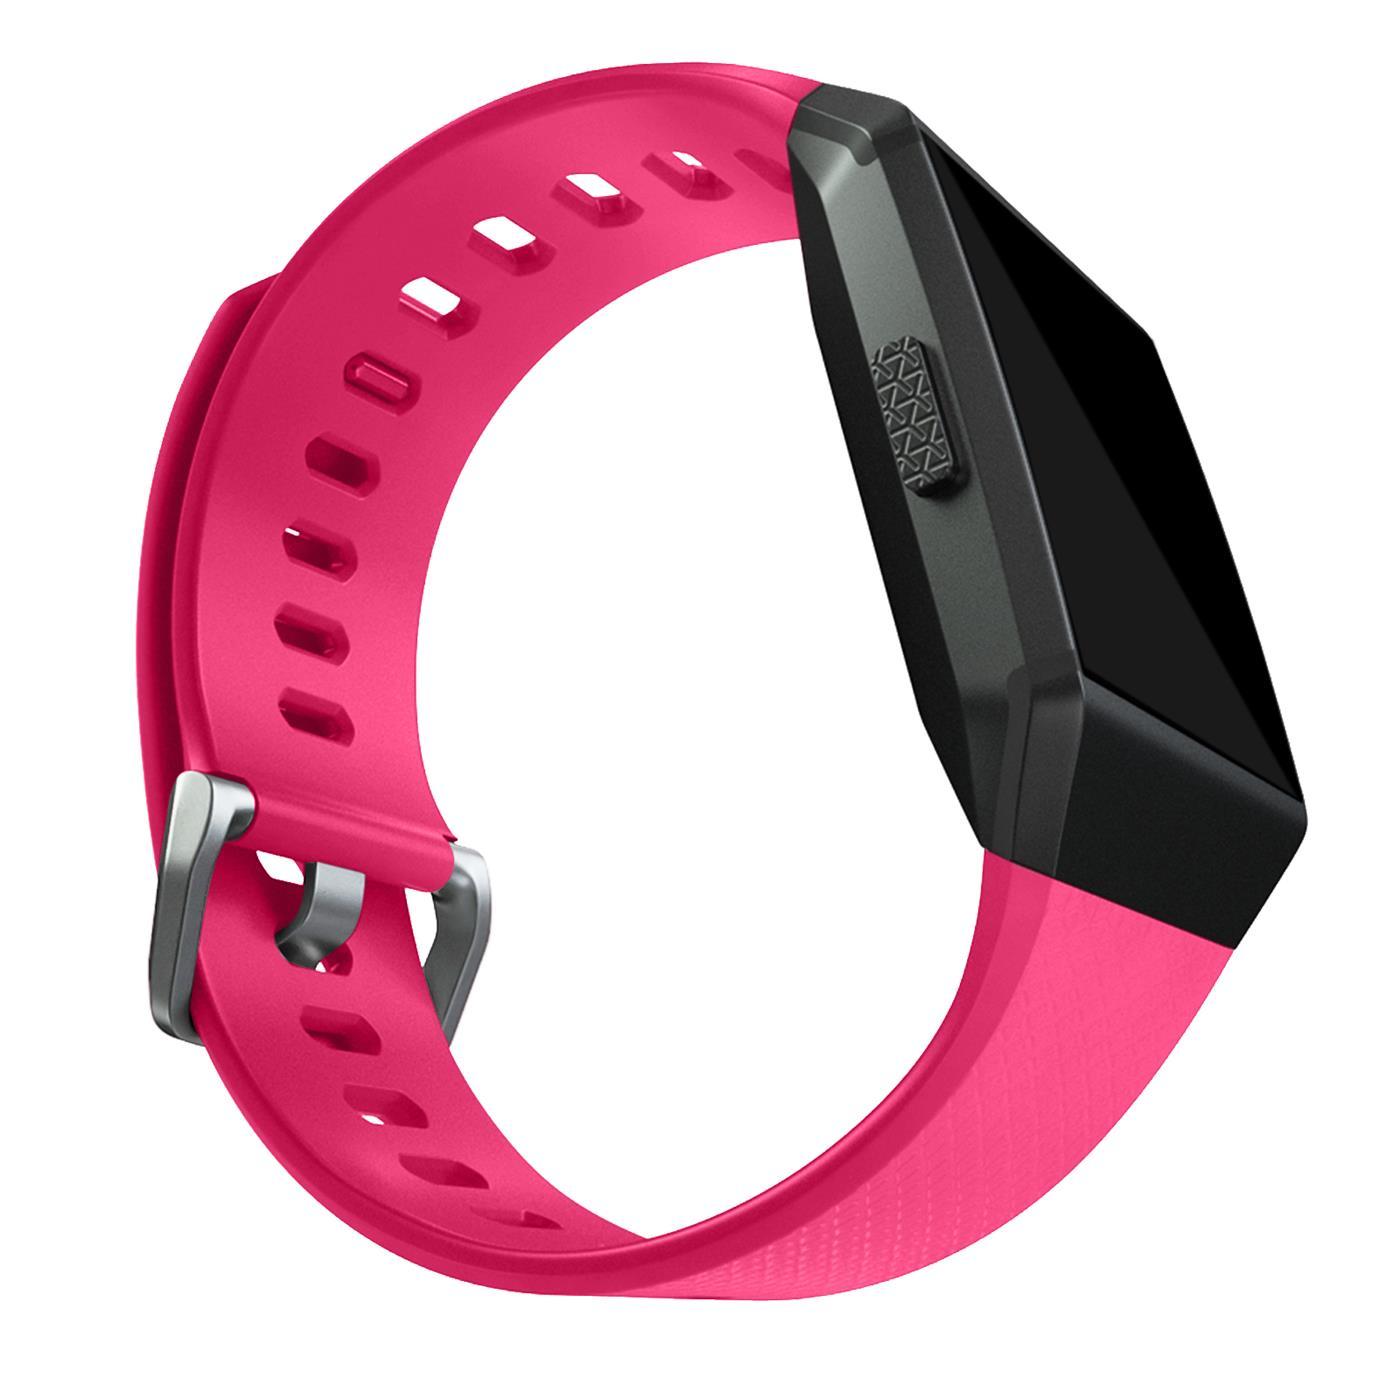 Fitbit-Groesse-S-oder-L-Ersatz-Silikon-Armband-Uhren-Sport-Band-Fitness-Tracker Indexbild 29